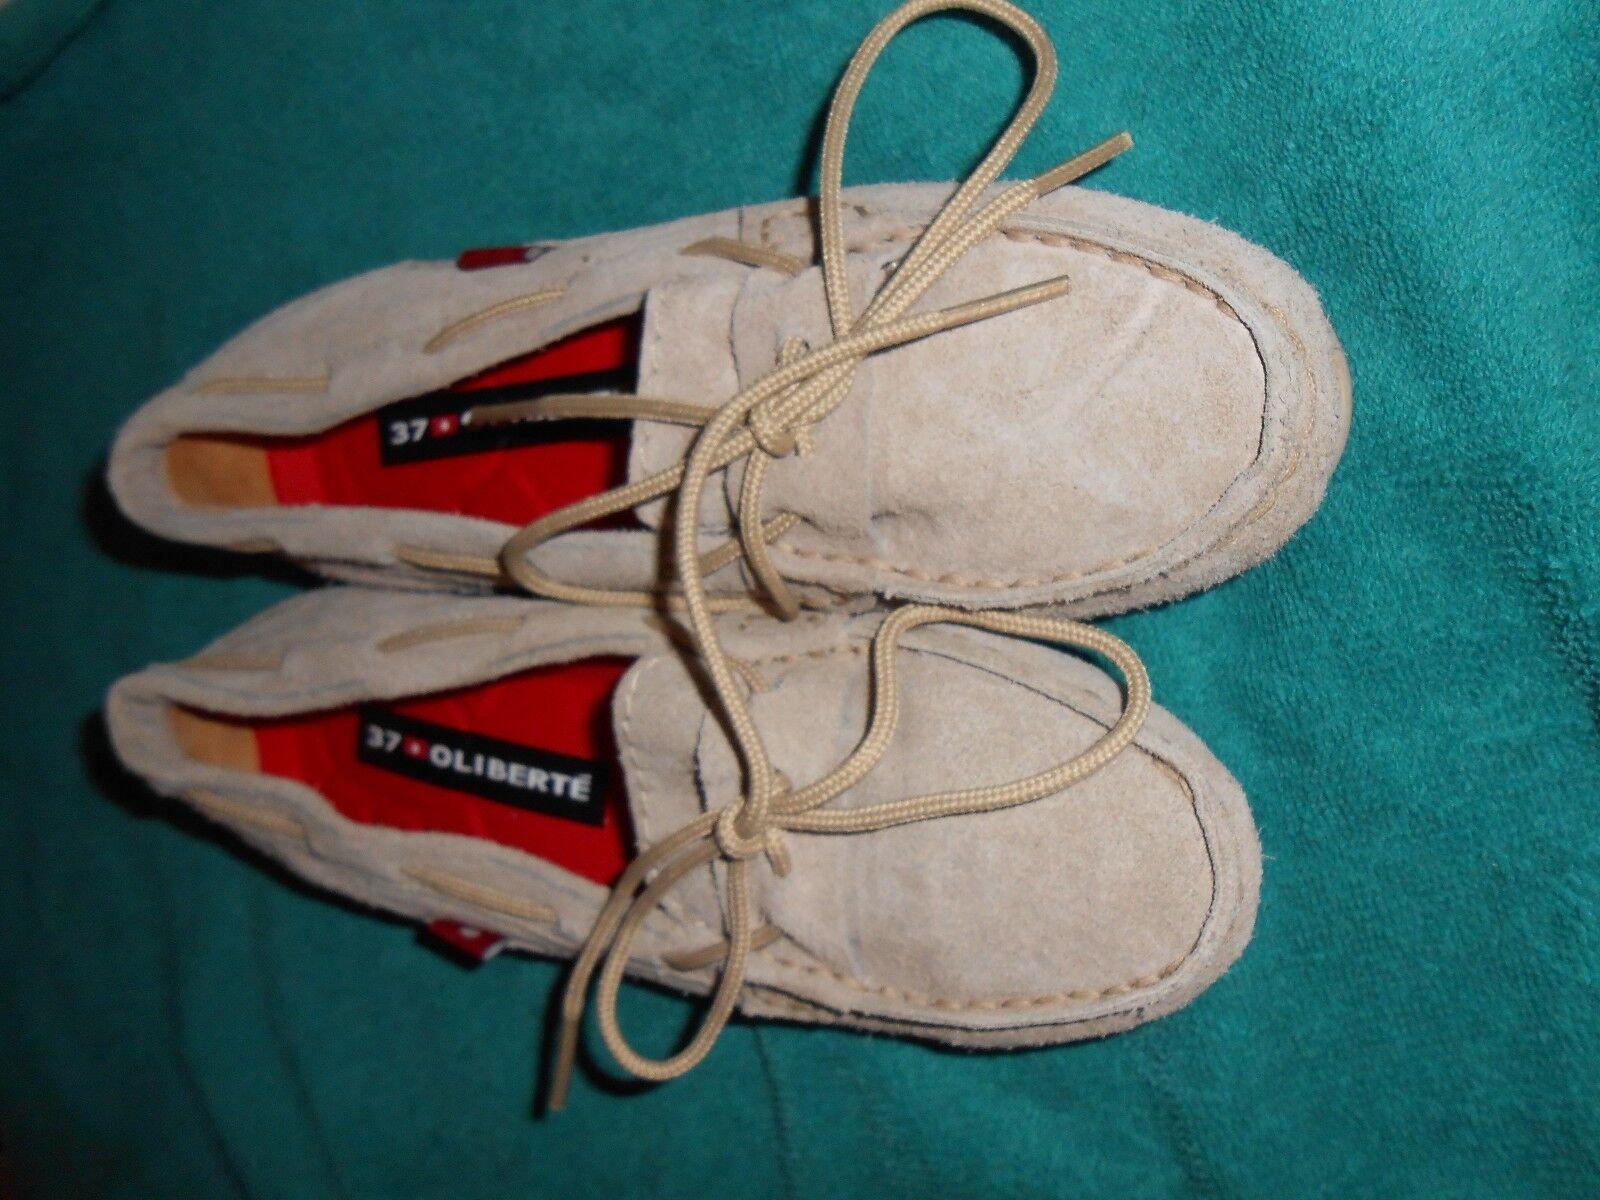 Oliberte Tan Suede Niami Cuir Bateau chaussures Flats Affichage Taille 7 M NEUF sans boîte